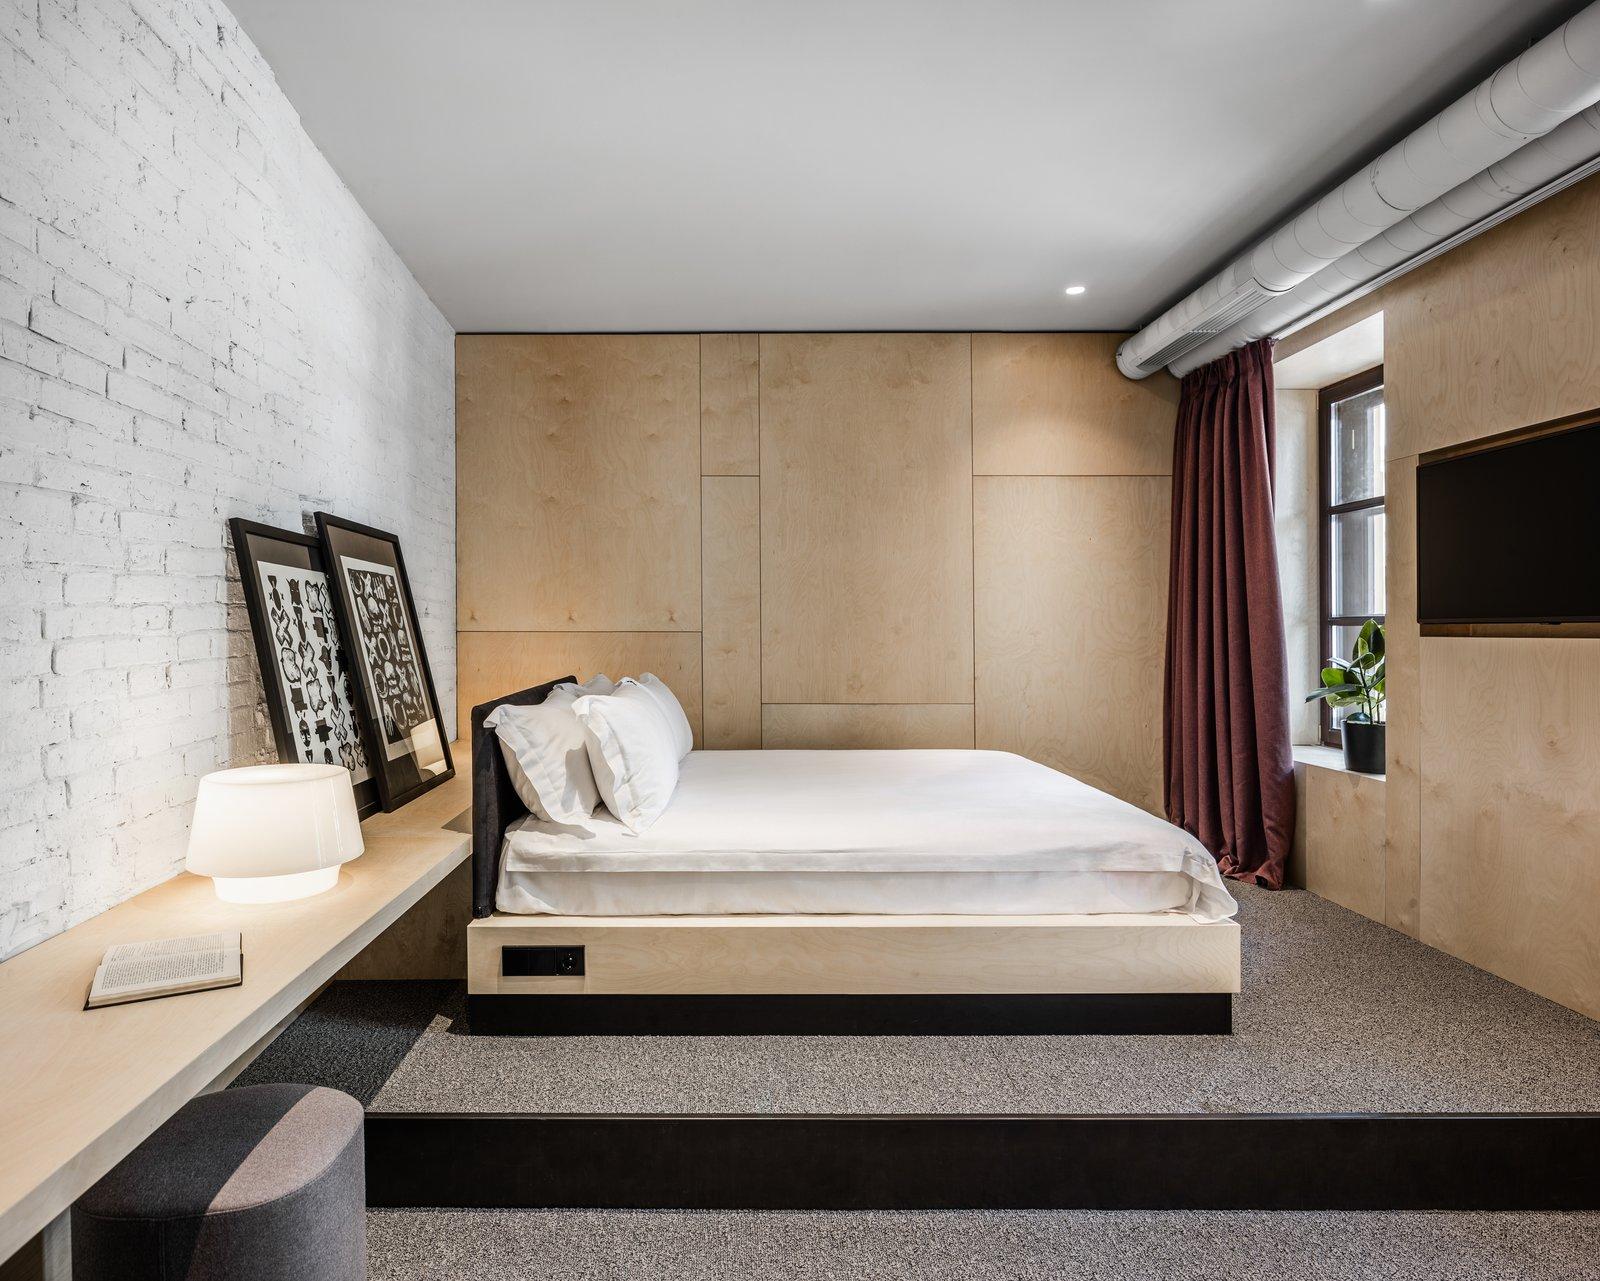 Bursa Hotel guest suite with whitewashed brick walls